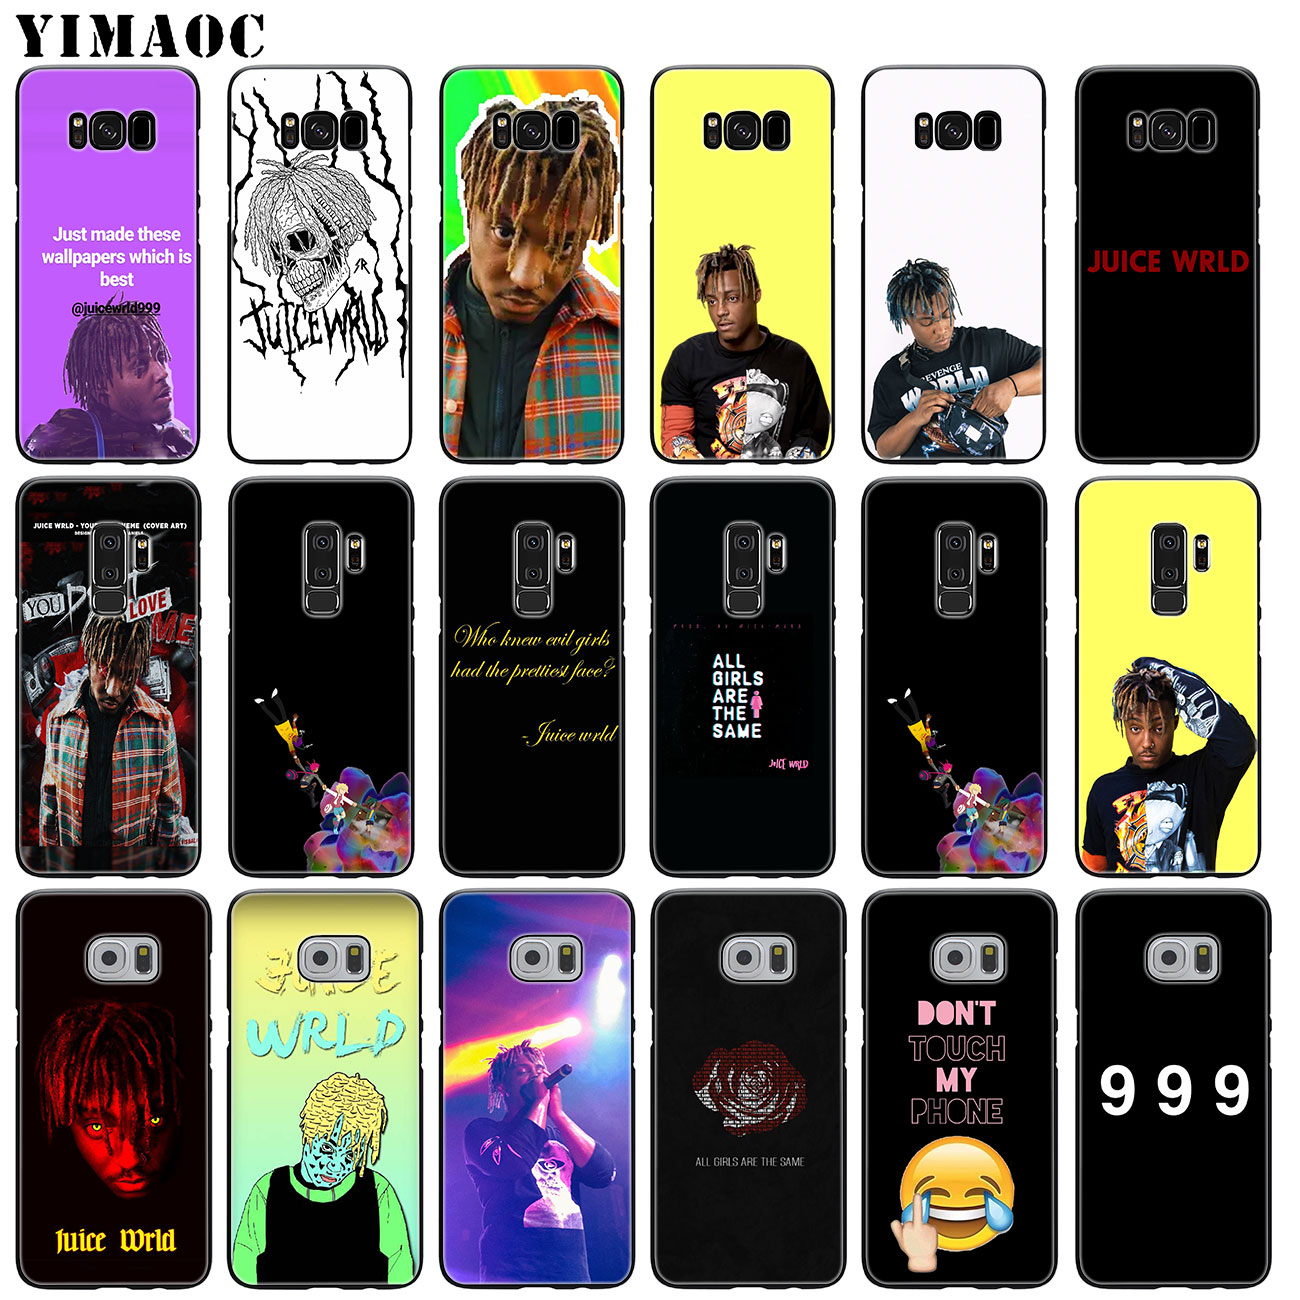 YIMAOC jugo de mundo 999 de silicona suave caso de teléfono para Samsung Galaxy S10 más S9 S8 más S6 S7 borde S10e cubierta negra E TPU